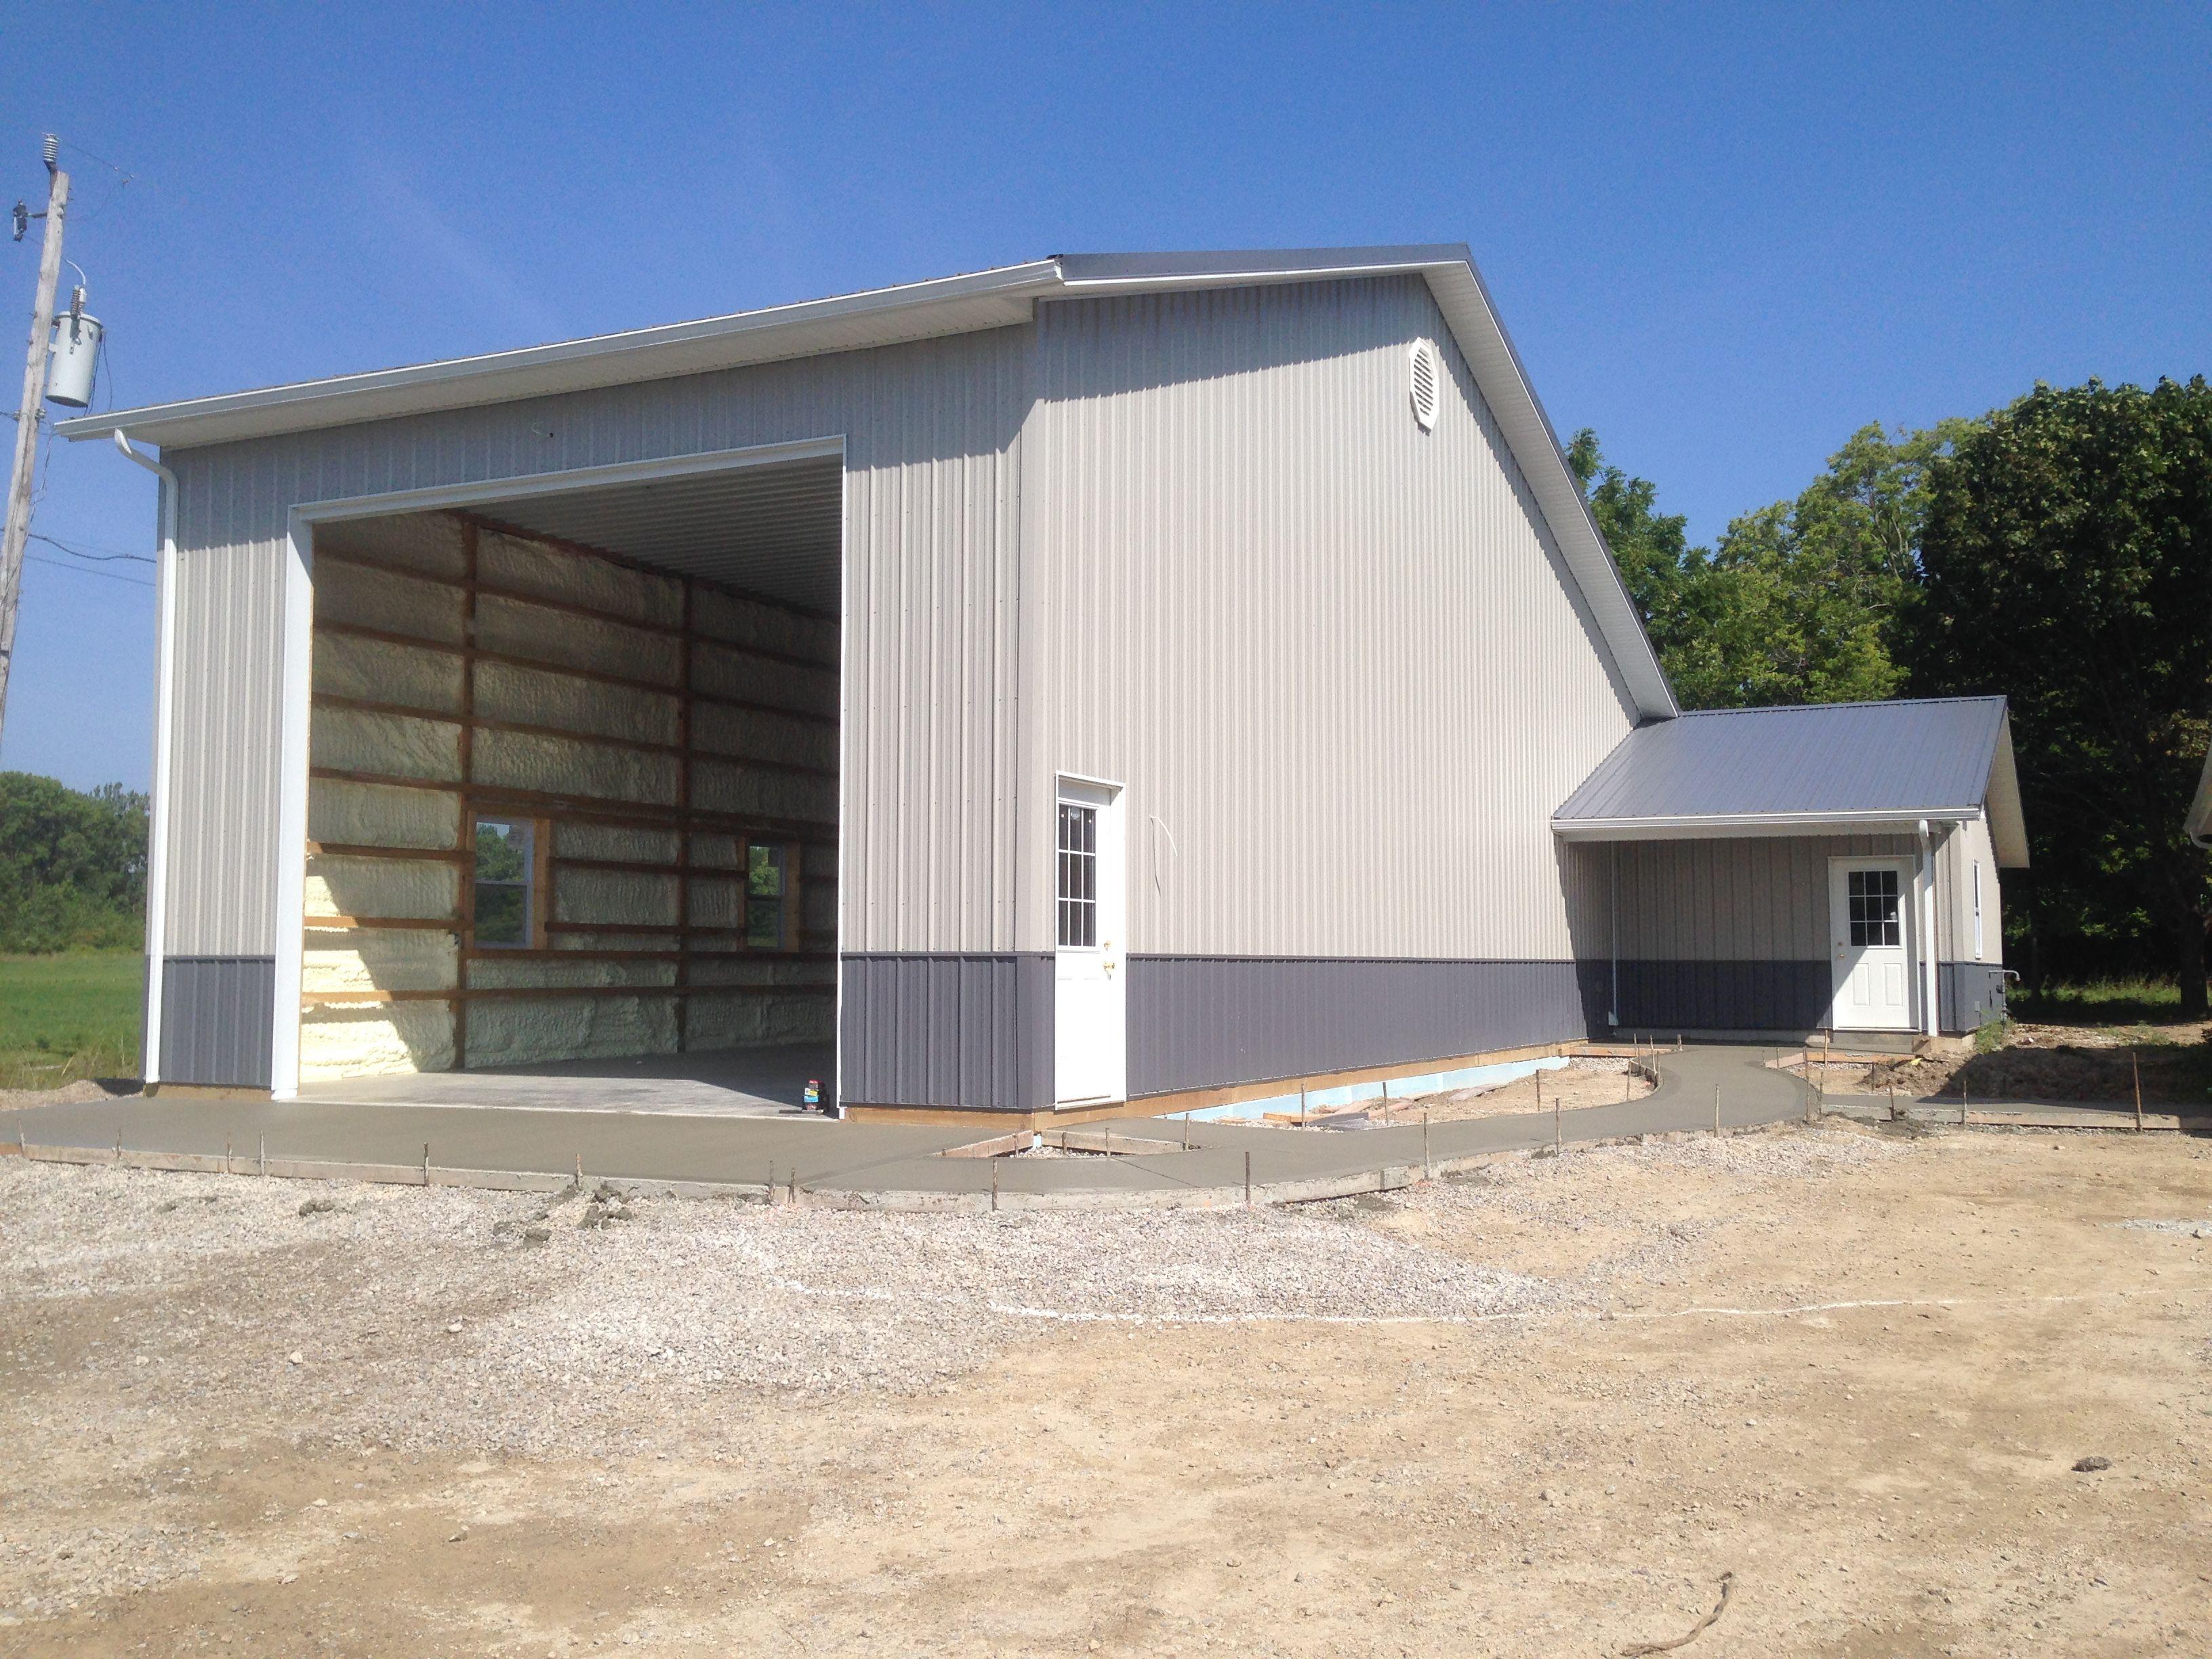 Storage Building Completed Near Oak Harbor. . . . . #storagebuilding  #polebuilding #atticalumber #polebarn #garage #storage Building